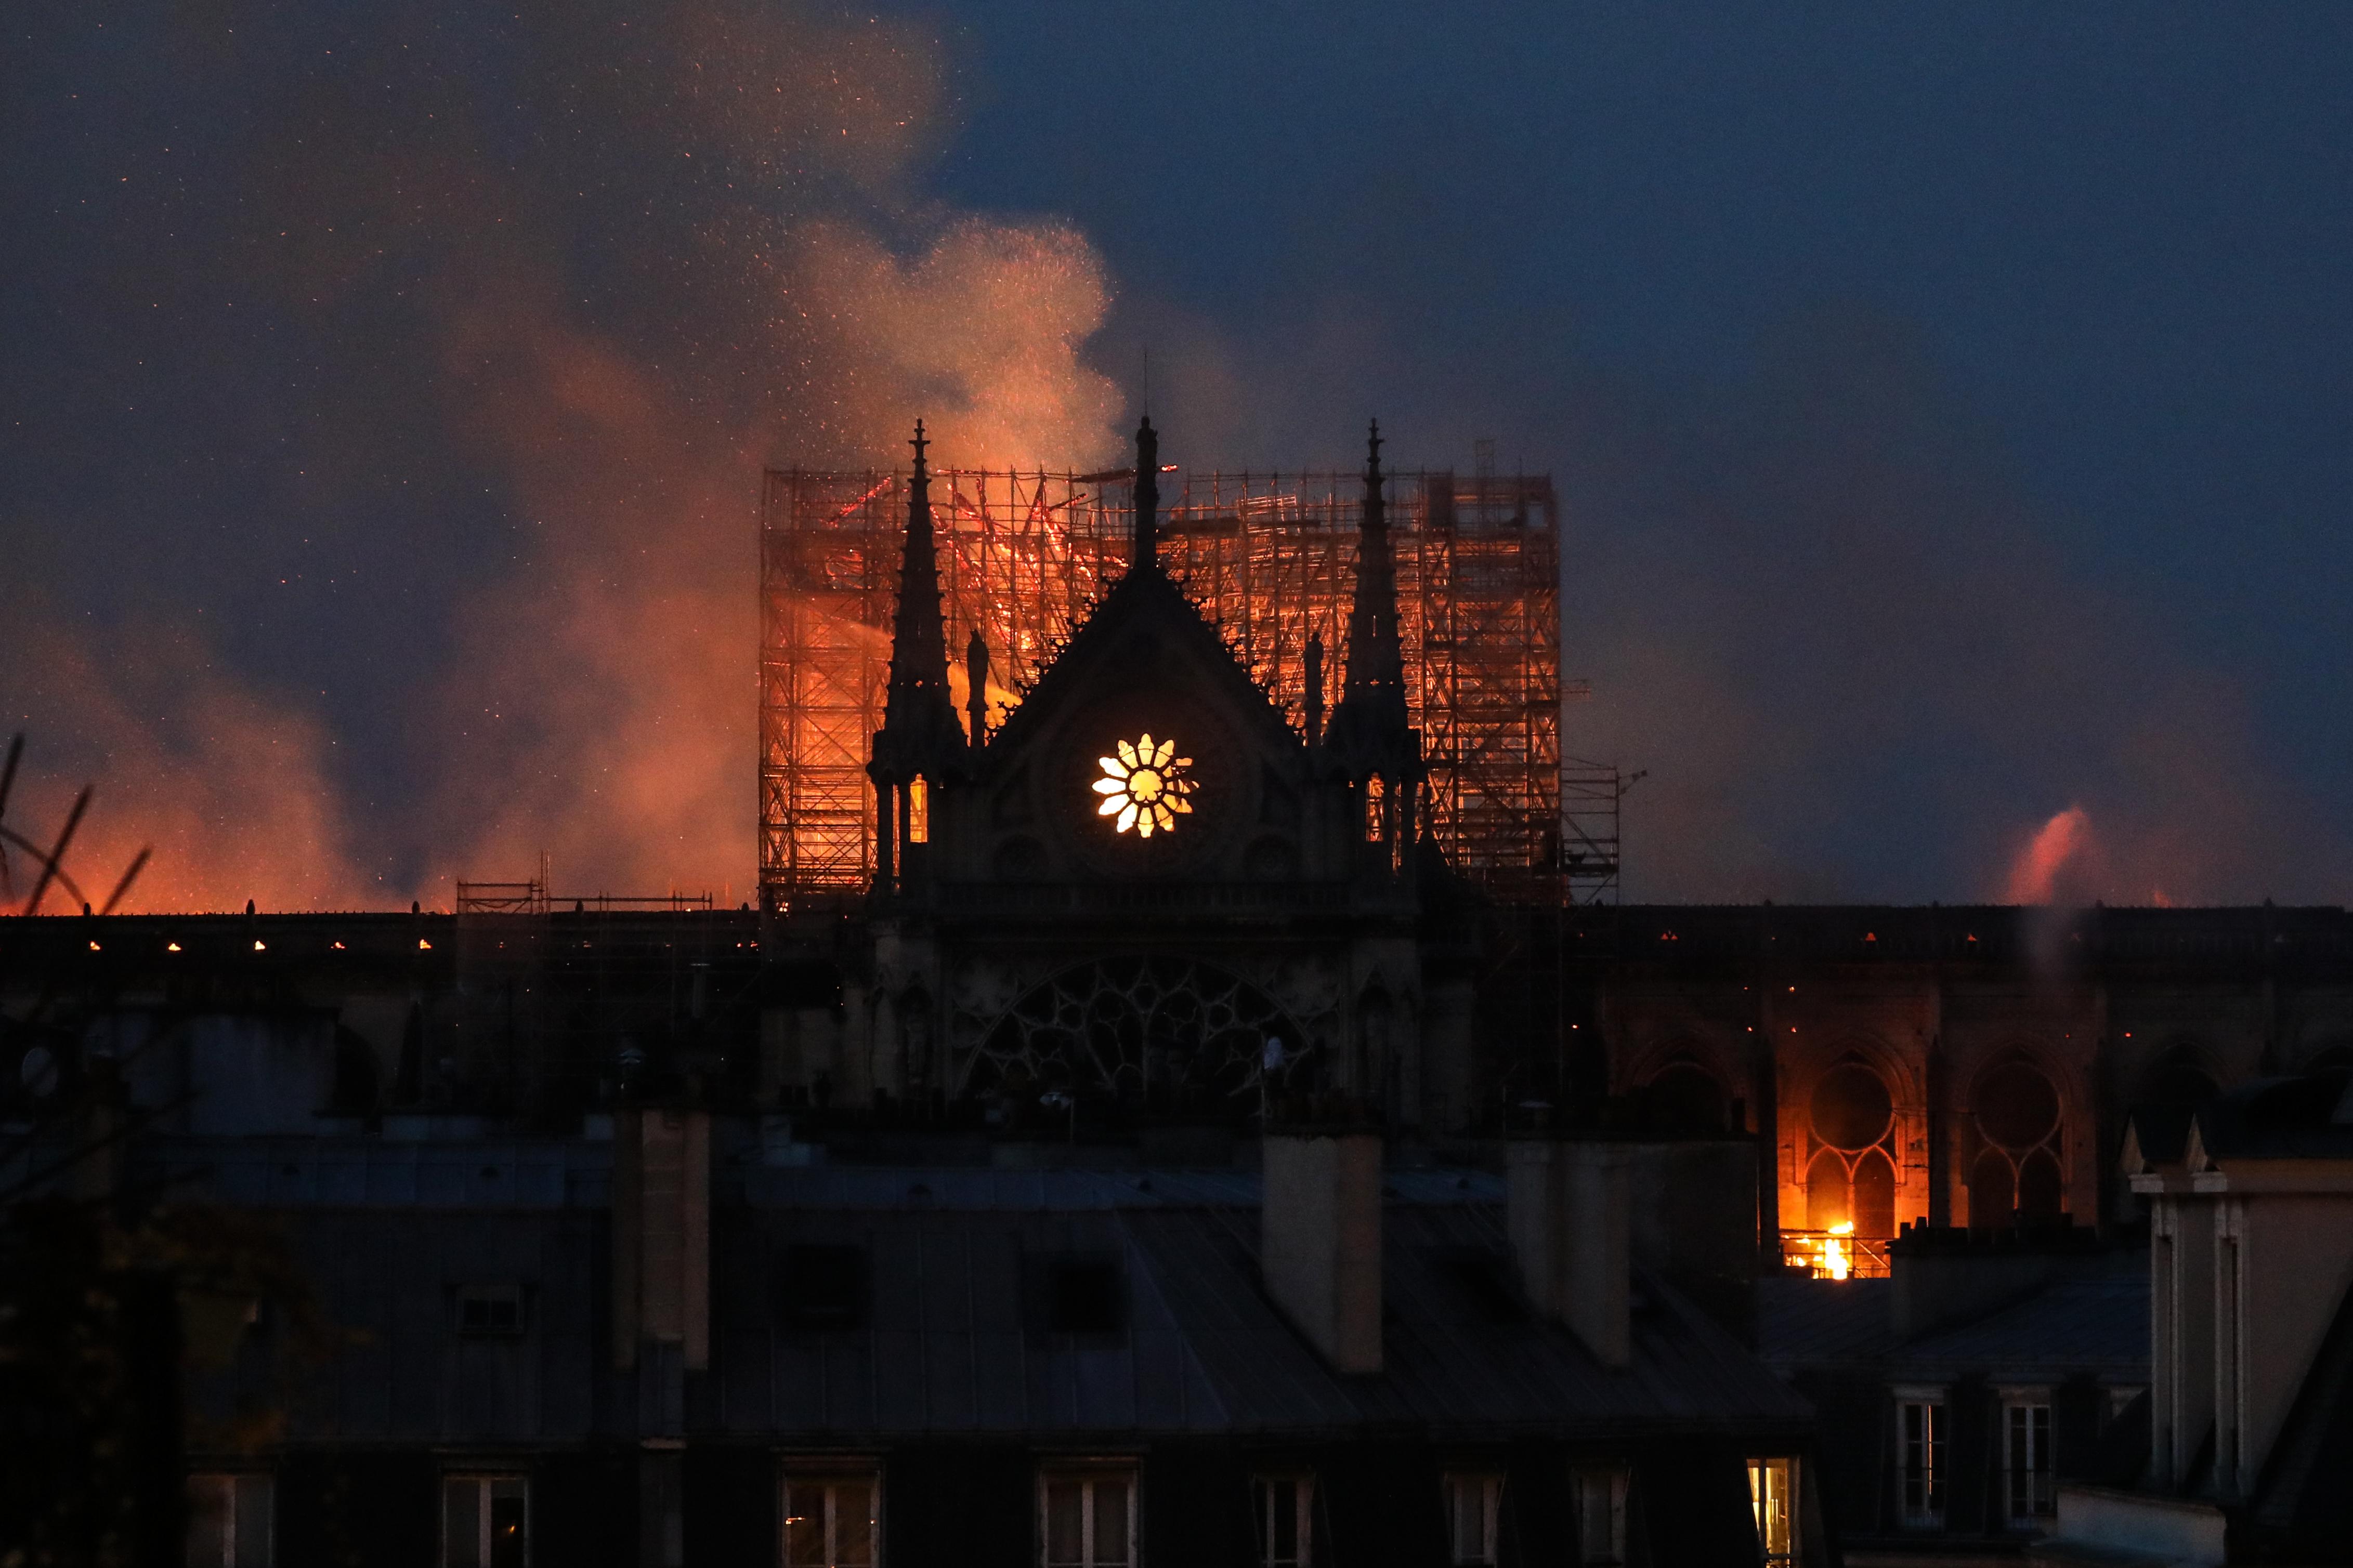 Vaticano expresa su tristeza tras incendio de la catedral de Notre Dame